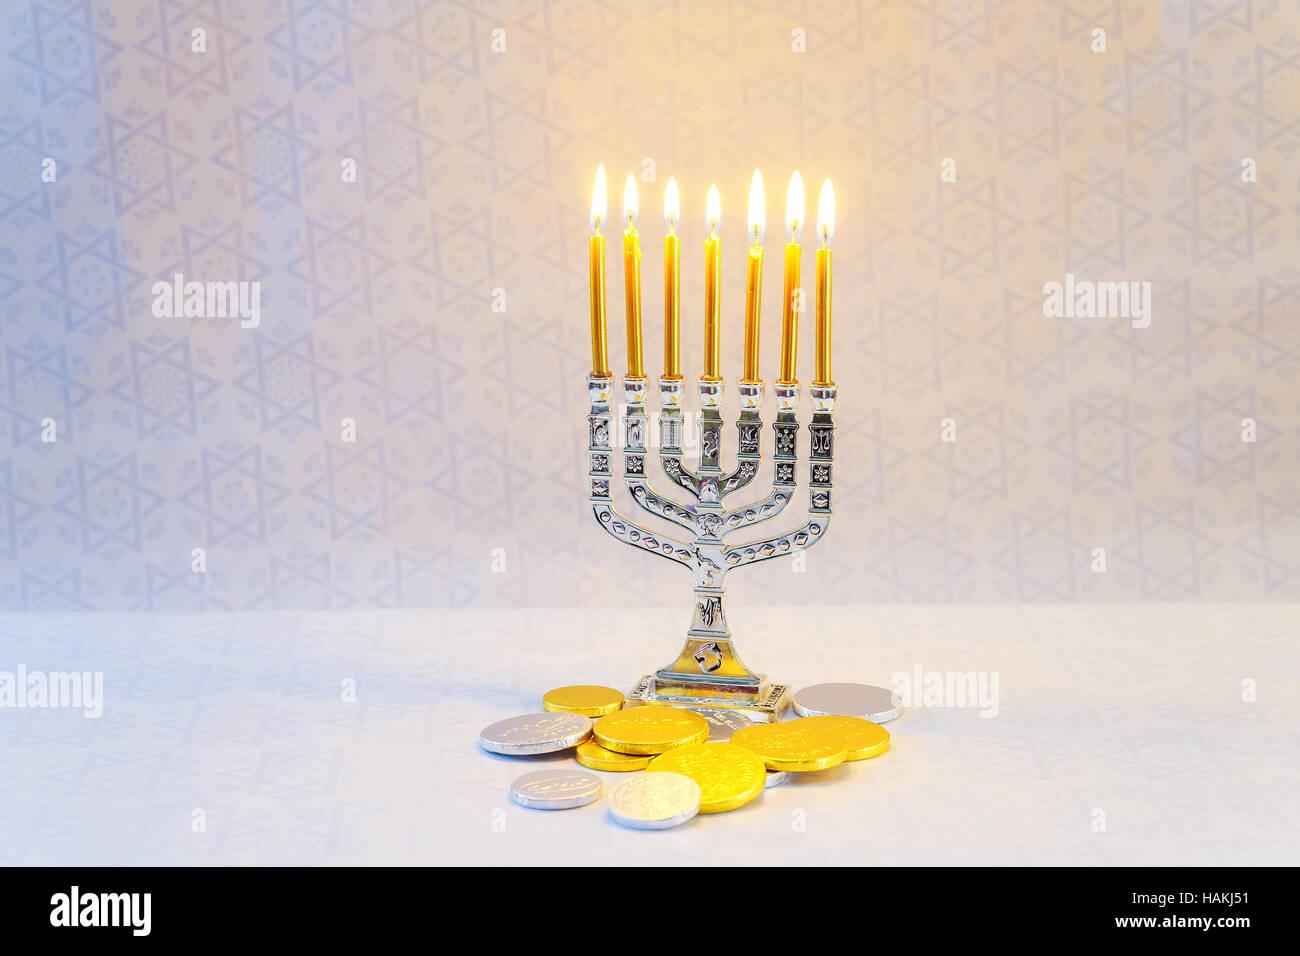 Jewish holiday hannukah symbols - menorah, donuts, chocolate coins and wooden dreidels jewish holiday Hanukkah with - Stock Image